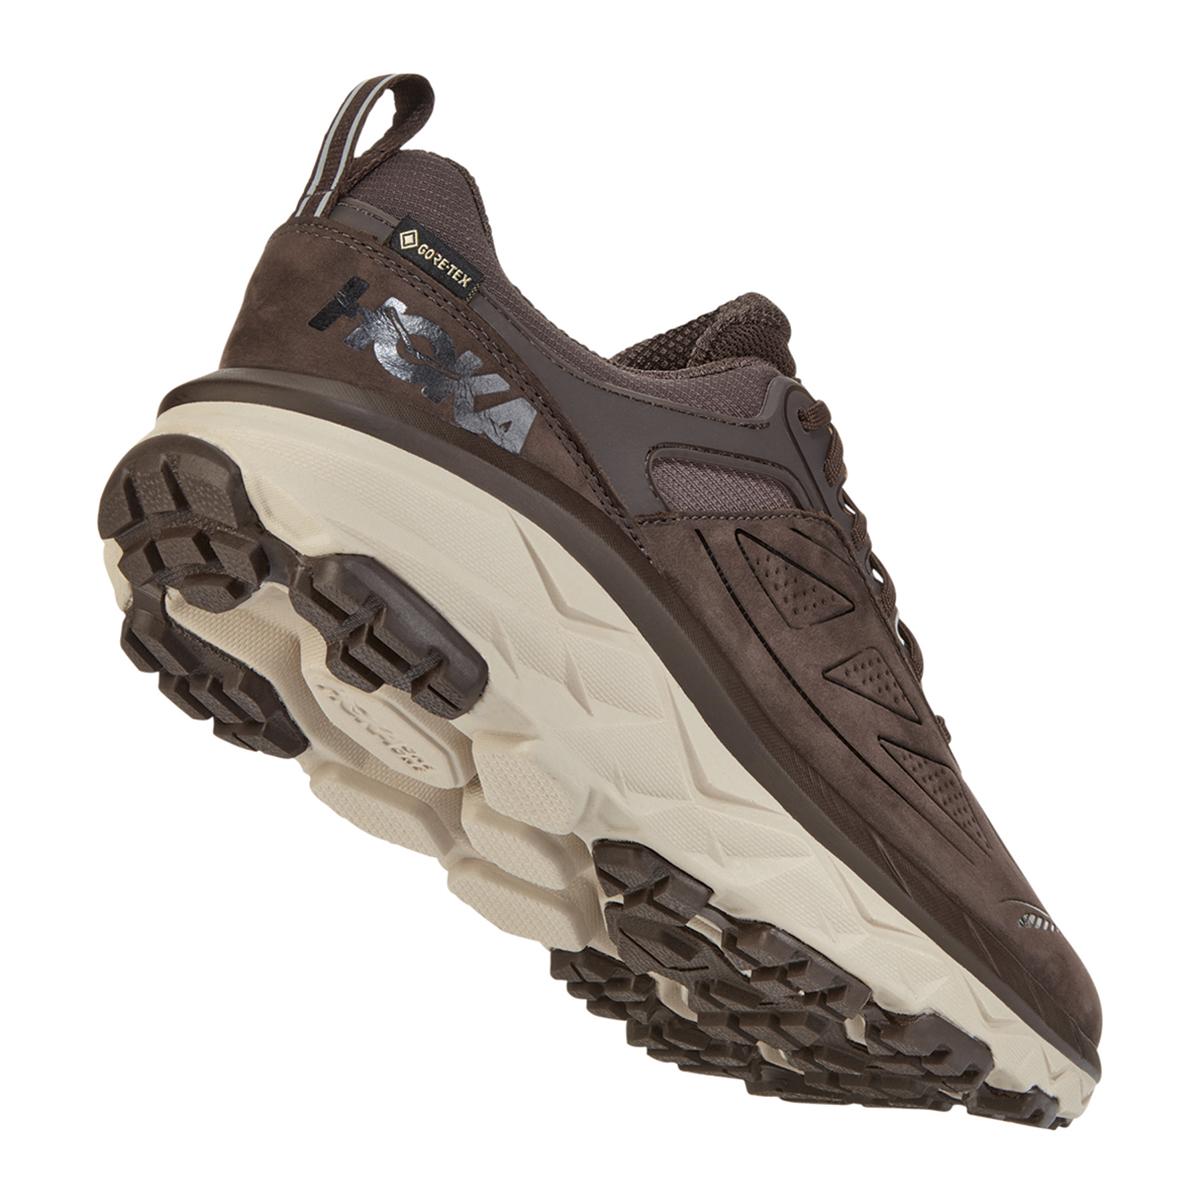 Men's Hoka One One Challenger Low Gore-Tex Trail Running Shoe - Color: Demitasse - Size: 7 - Width: Regular, Demitasse, large, image 6